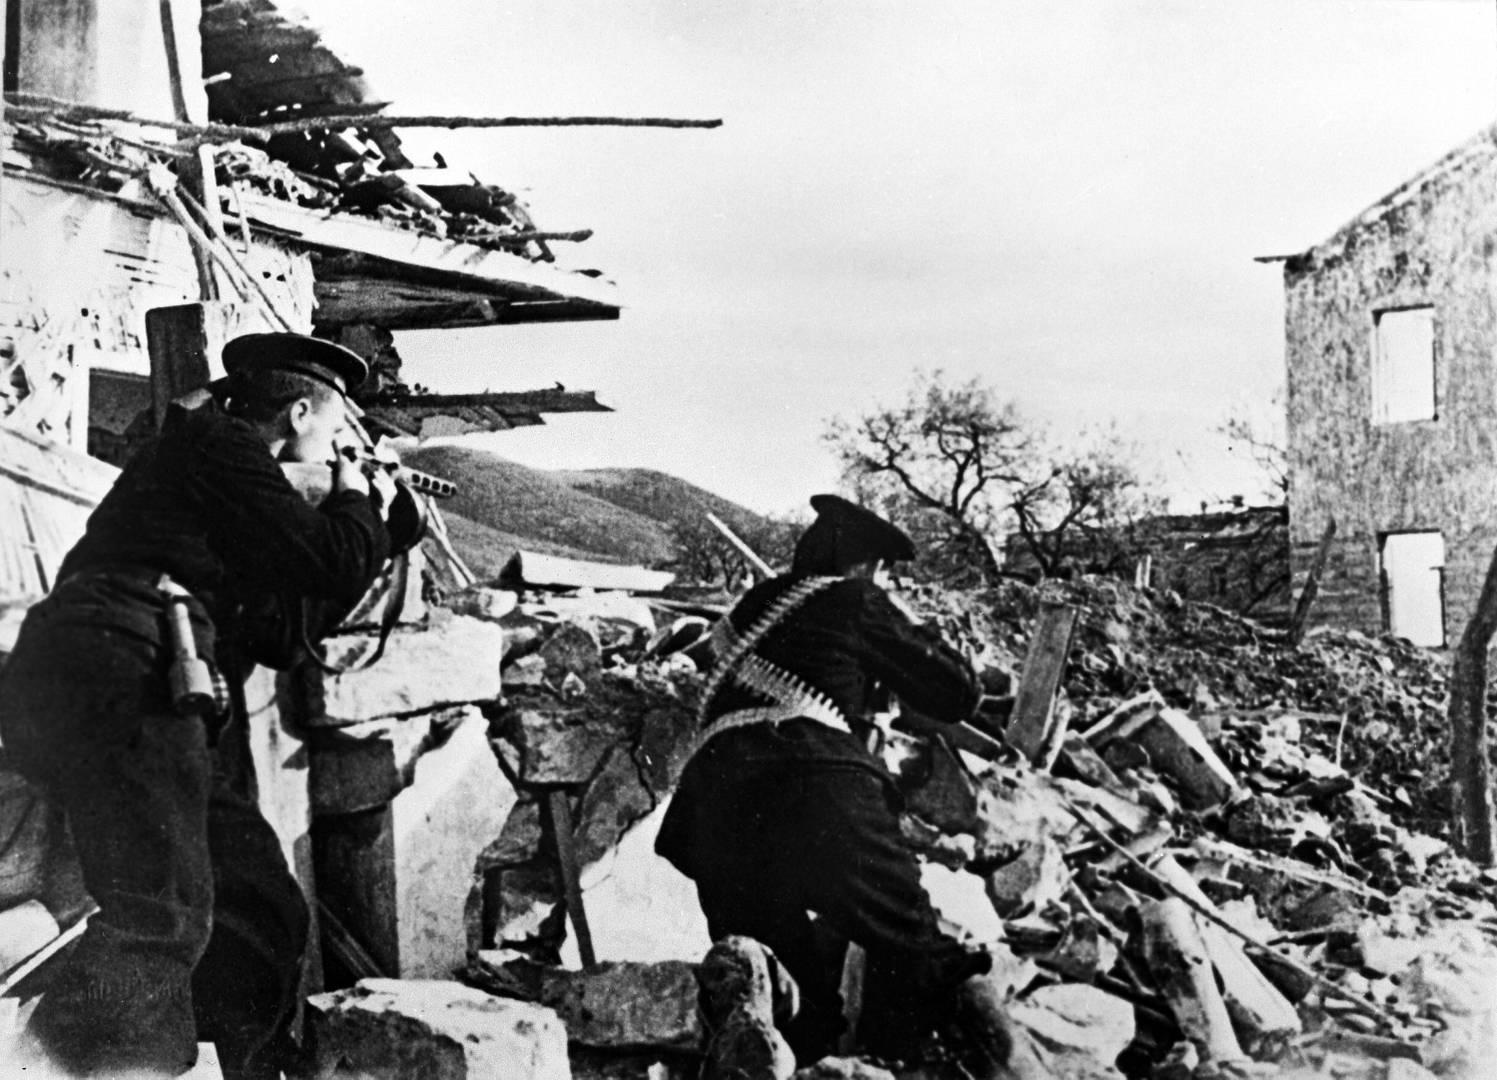 Морпехи Черноморского флота в бою под Севастополем. Май 1942 года